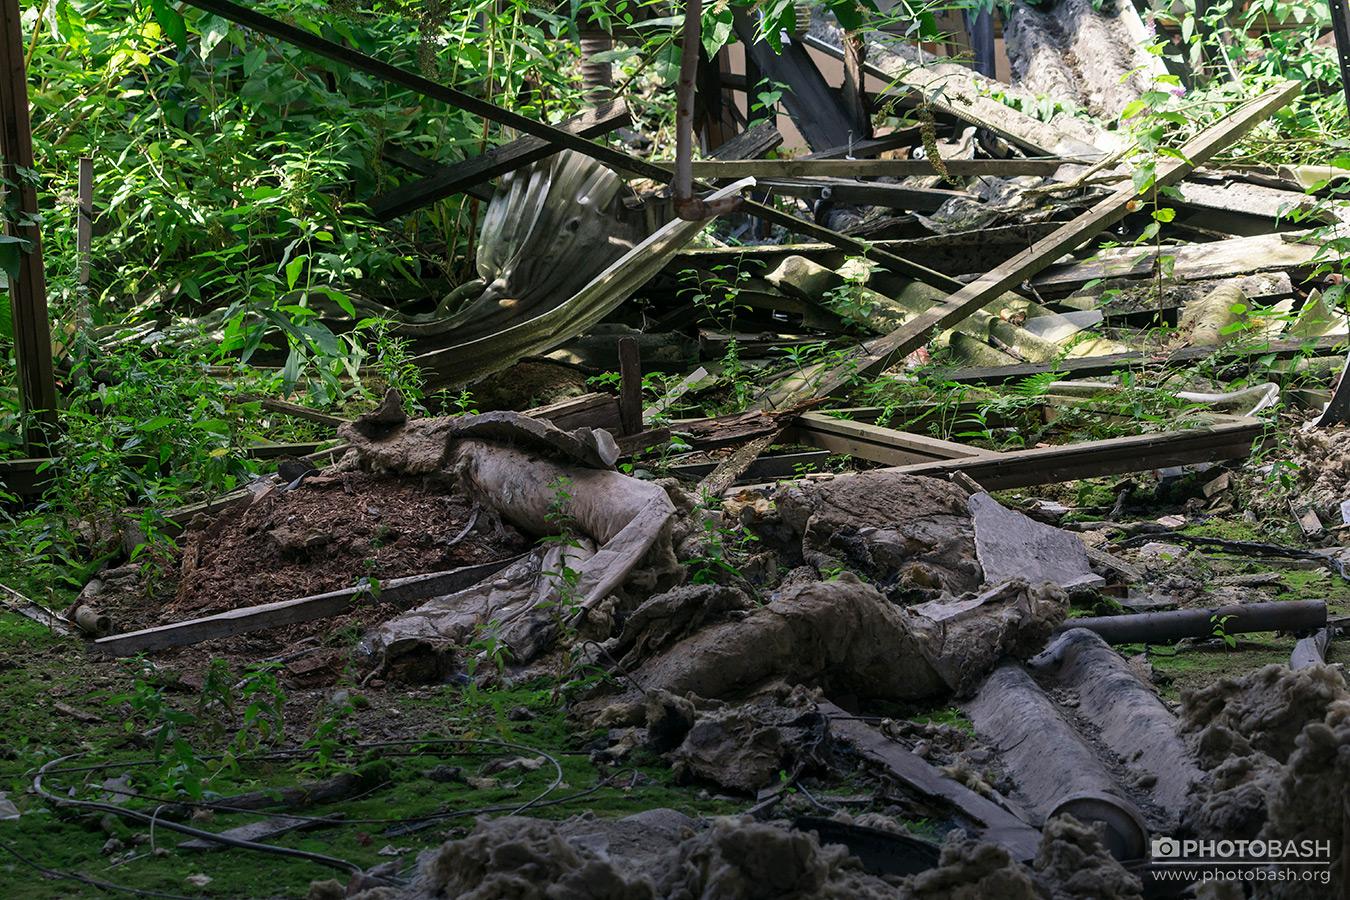 Overgrown-Factory-Debris-Rubble.jpg